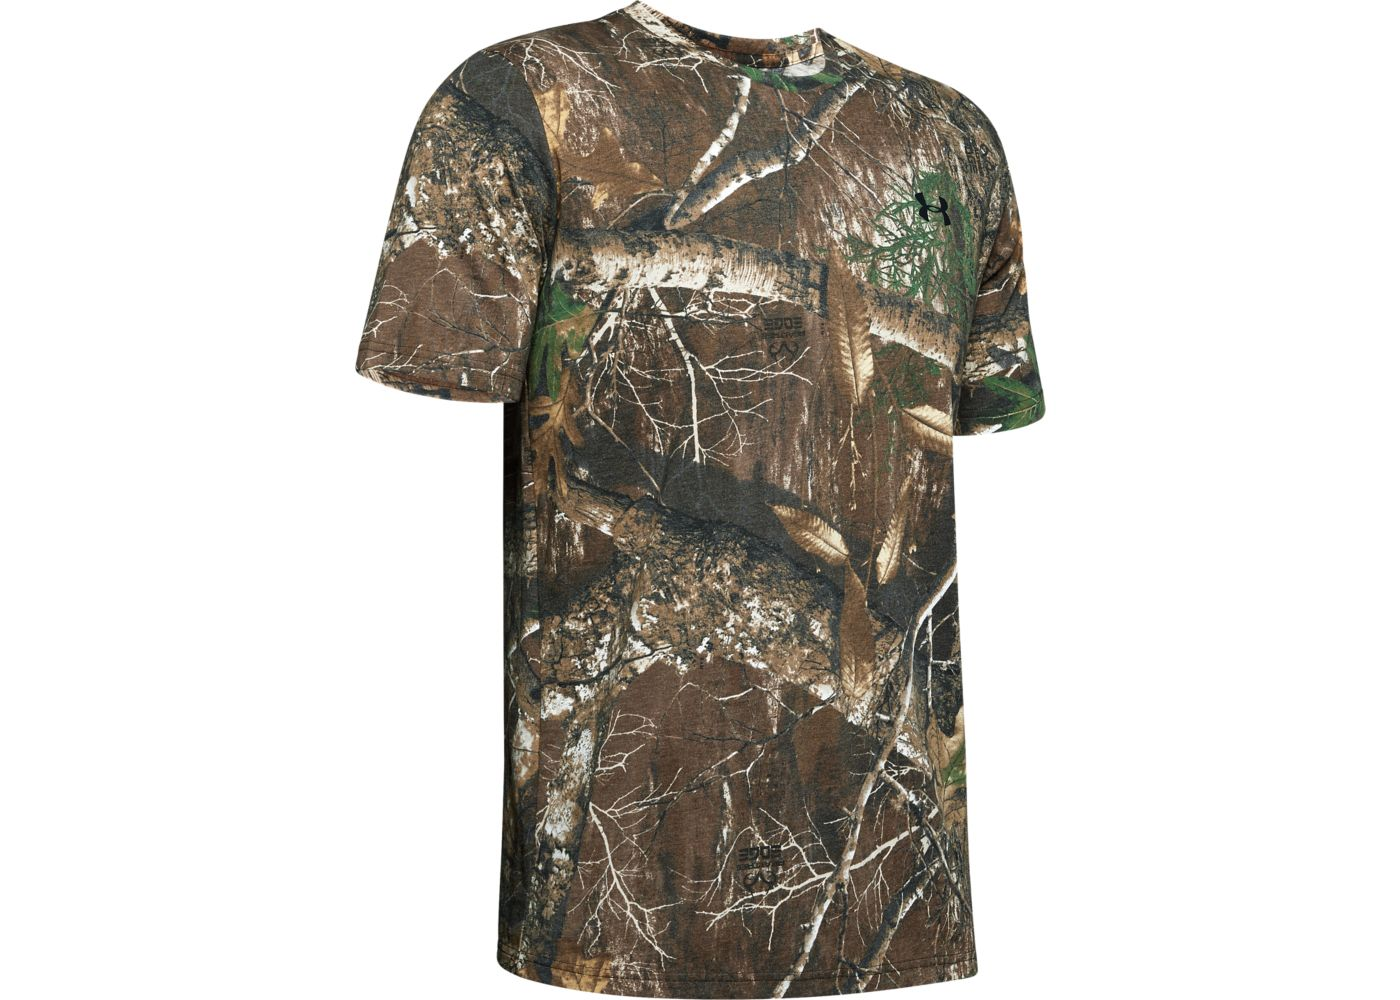 UA Men's Scent Control Short Sleeve Hunting T-Shirt